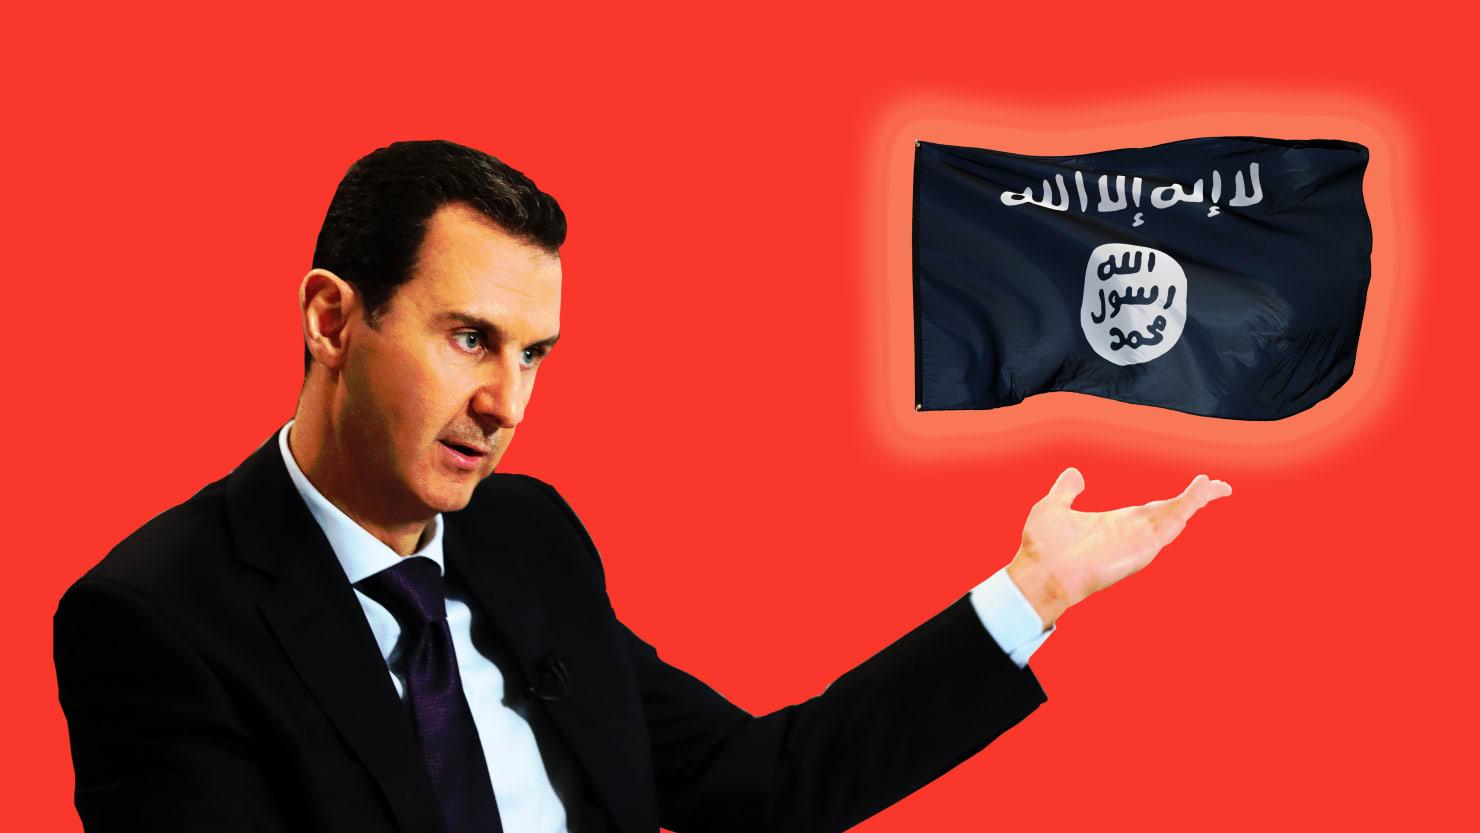 Assad Henchman: Here's How We Built ISIS